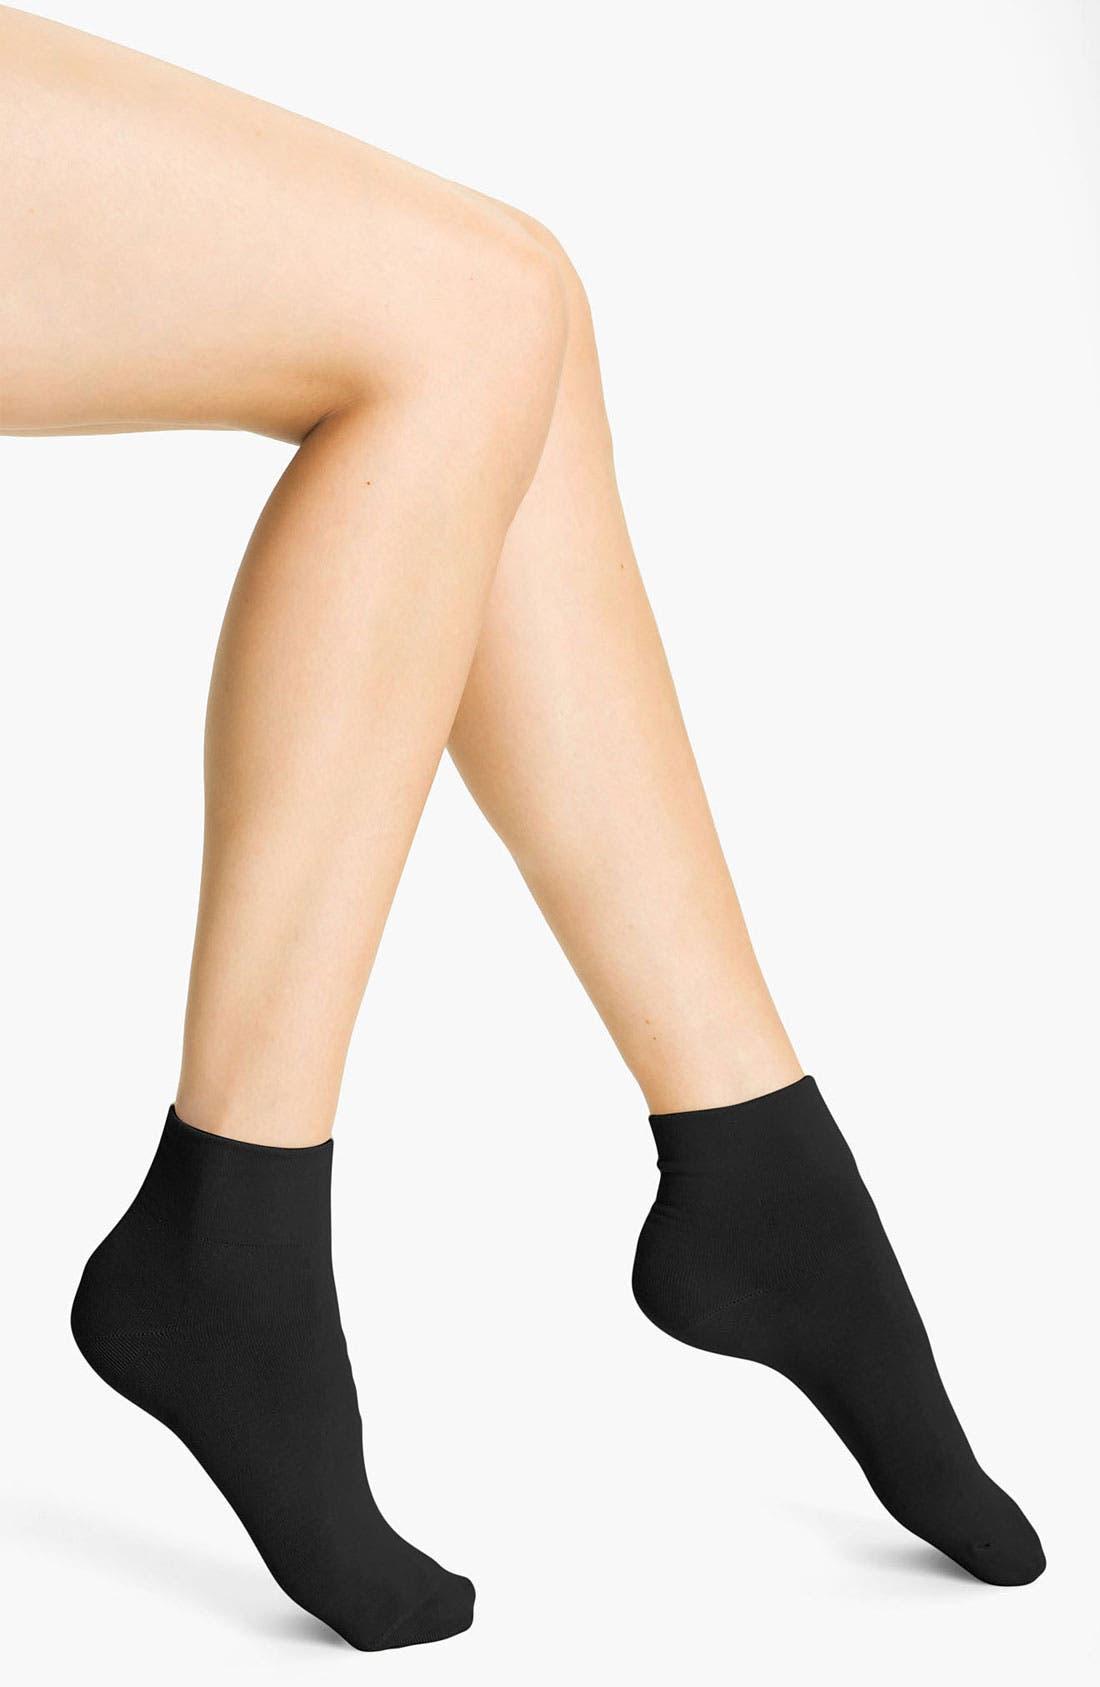 Cotton Blend Socks,                             Main thumbnail 1, color,                             003